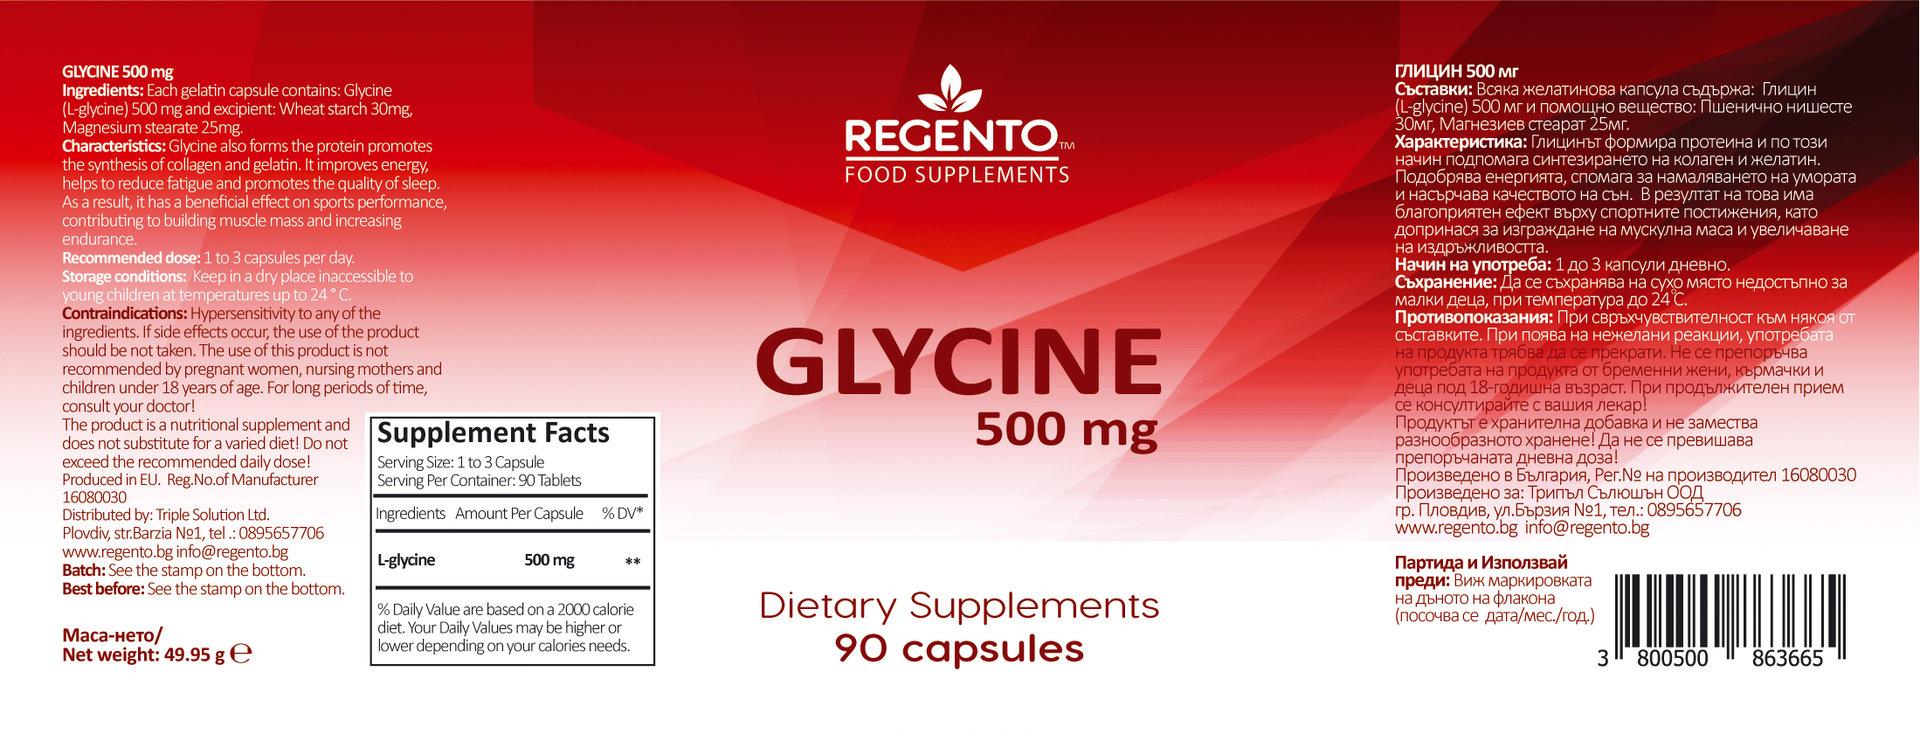 REGENTO GLYCINE 500mg 90 capsules